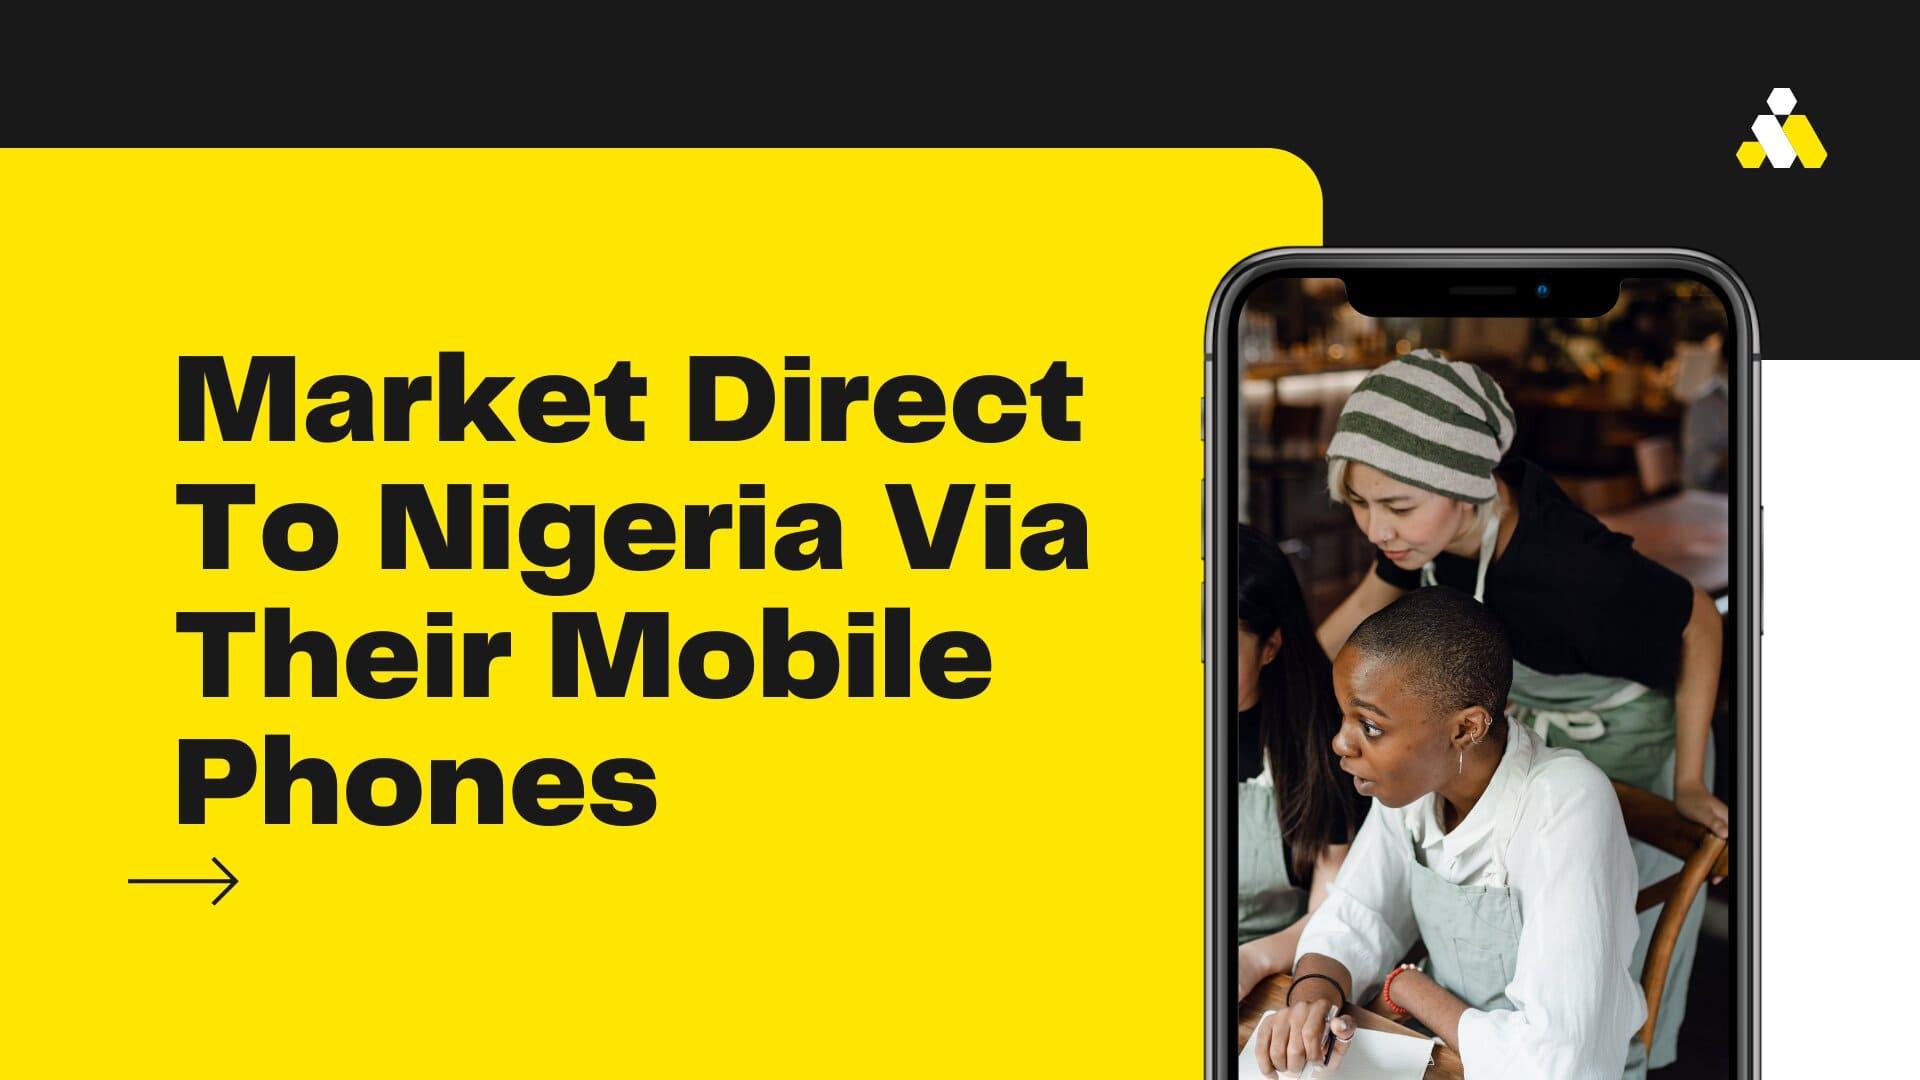 Market Direct To Nigeria Via Their Mobile Phones